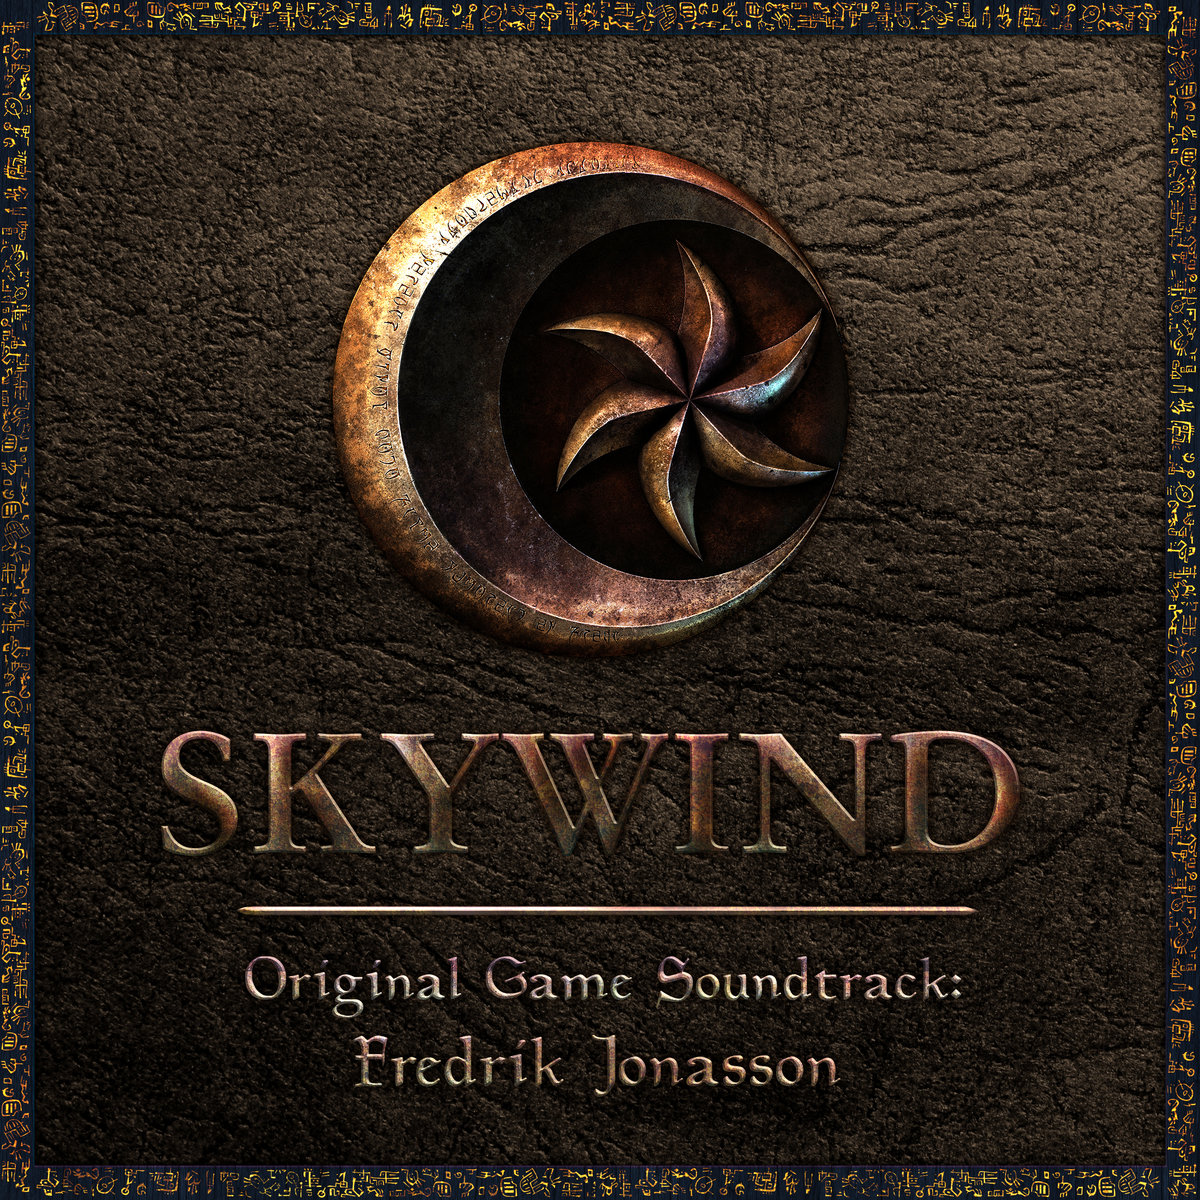 Skywind Original Game Soundtrack Fredrik Jonasson Fredrik Jonasson